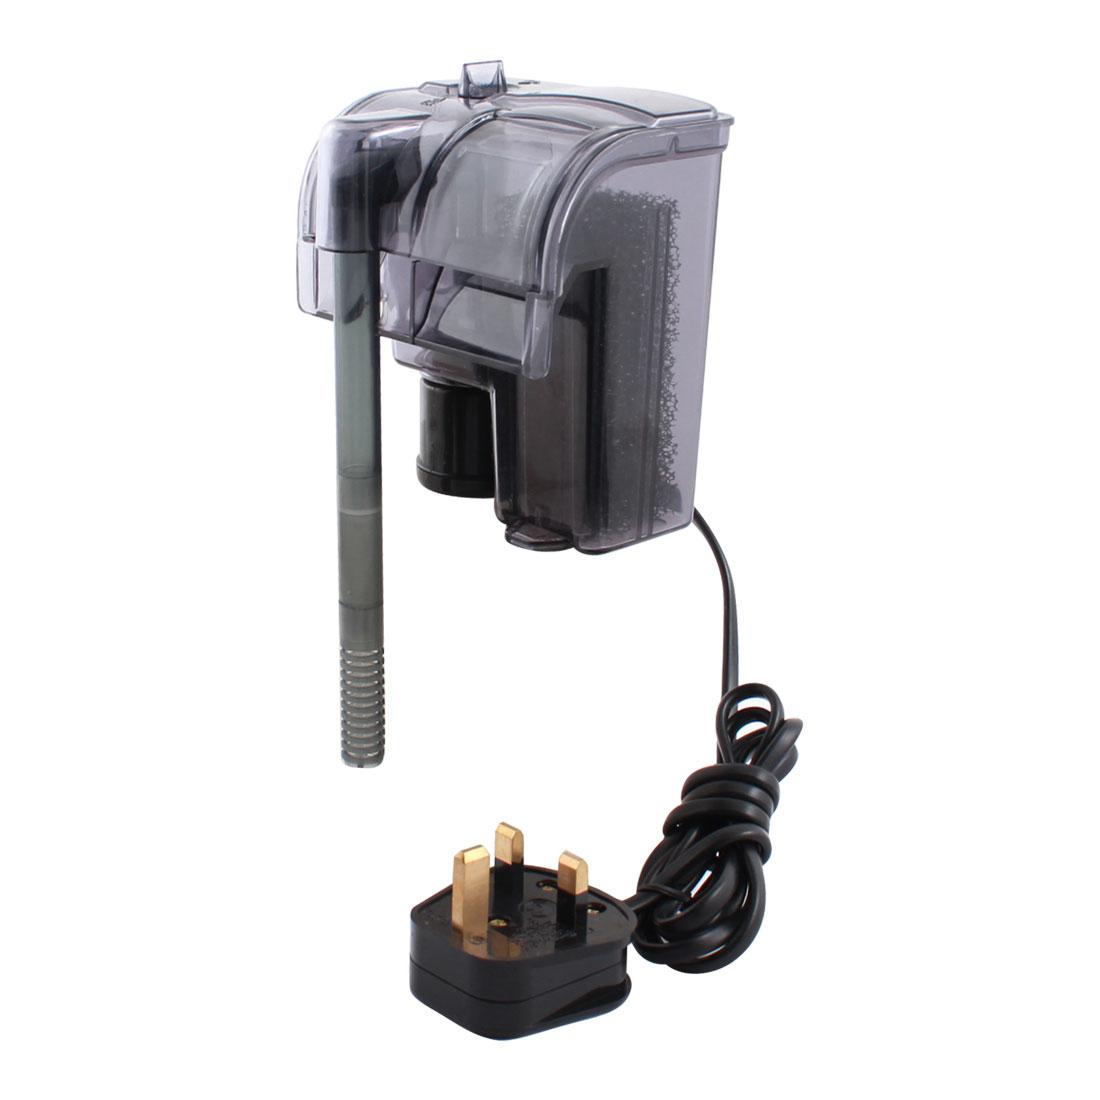 UK Plug AC 220-240V 185L/H Aquarium Internal Submersible Pump Filter